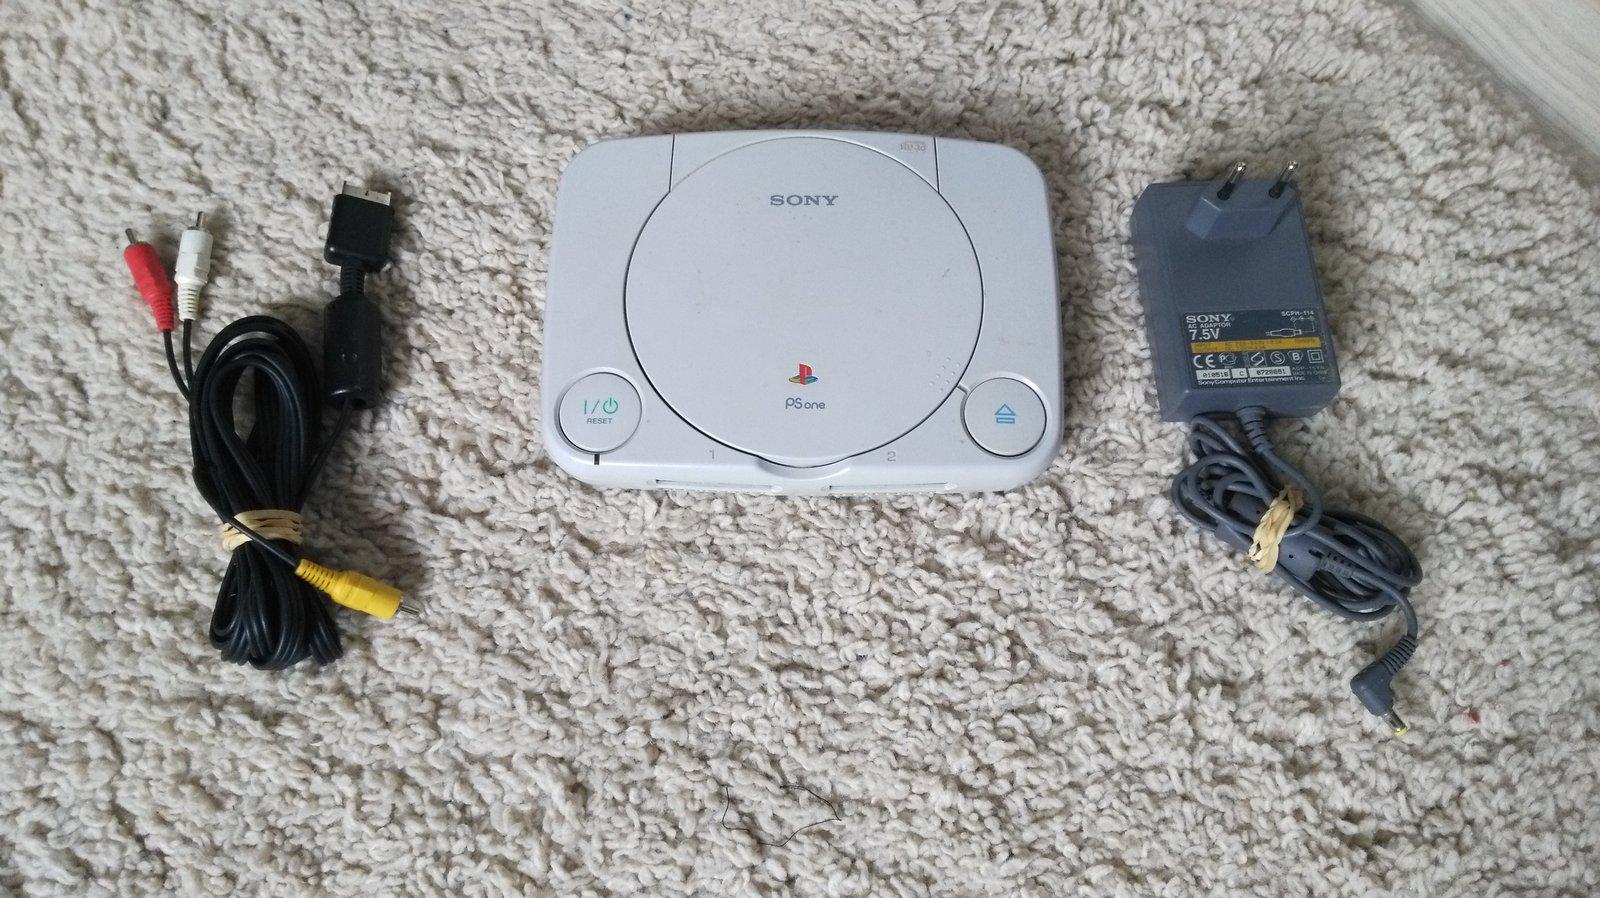 [VDS] Jeux PS3, PS2, Naruto Boruto collector PS4, VITA, matos PSOne MAJ 24/06/2020 200126093243703928